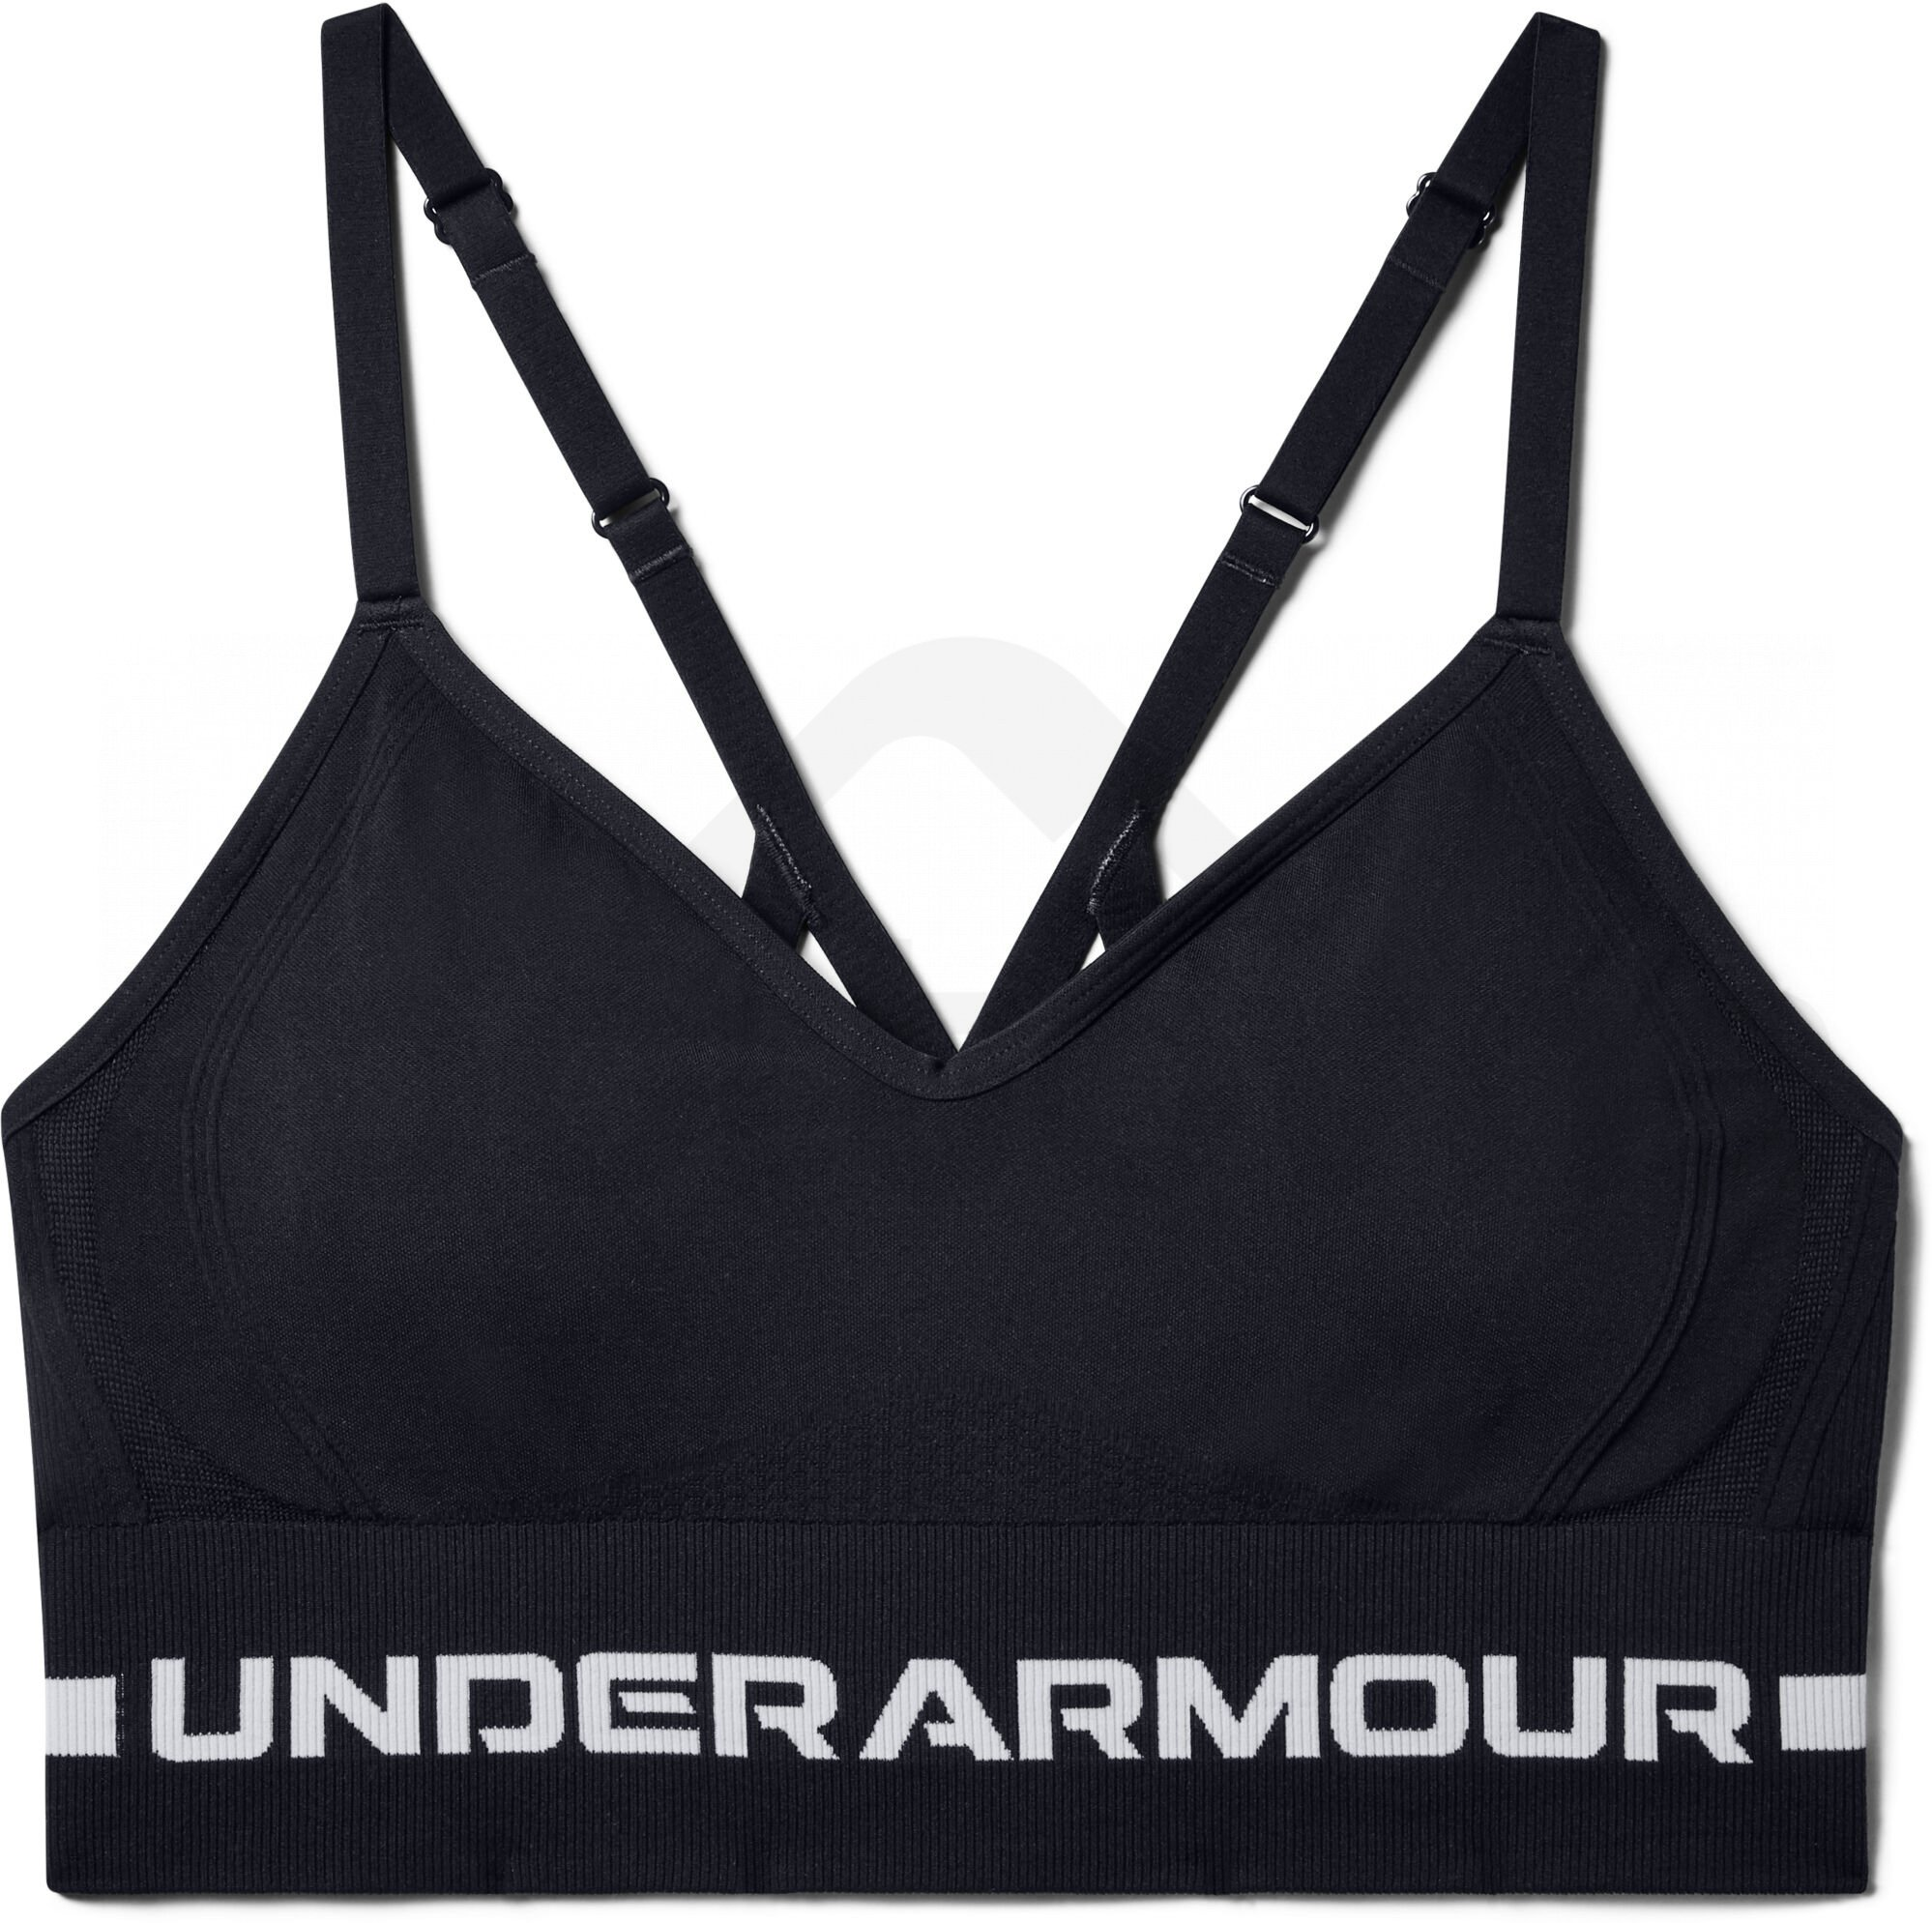 iic-underarmour-1357719-001-hero-x-0001